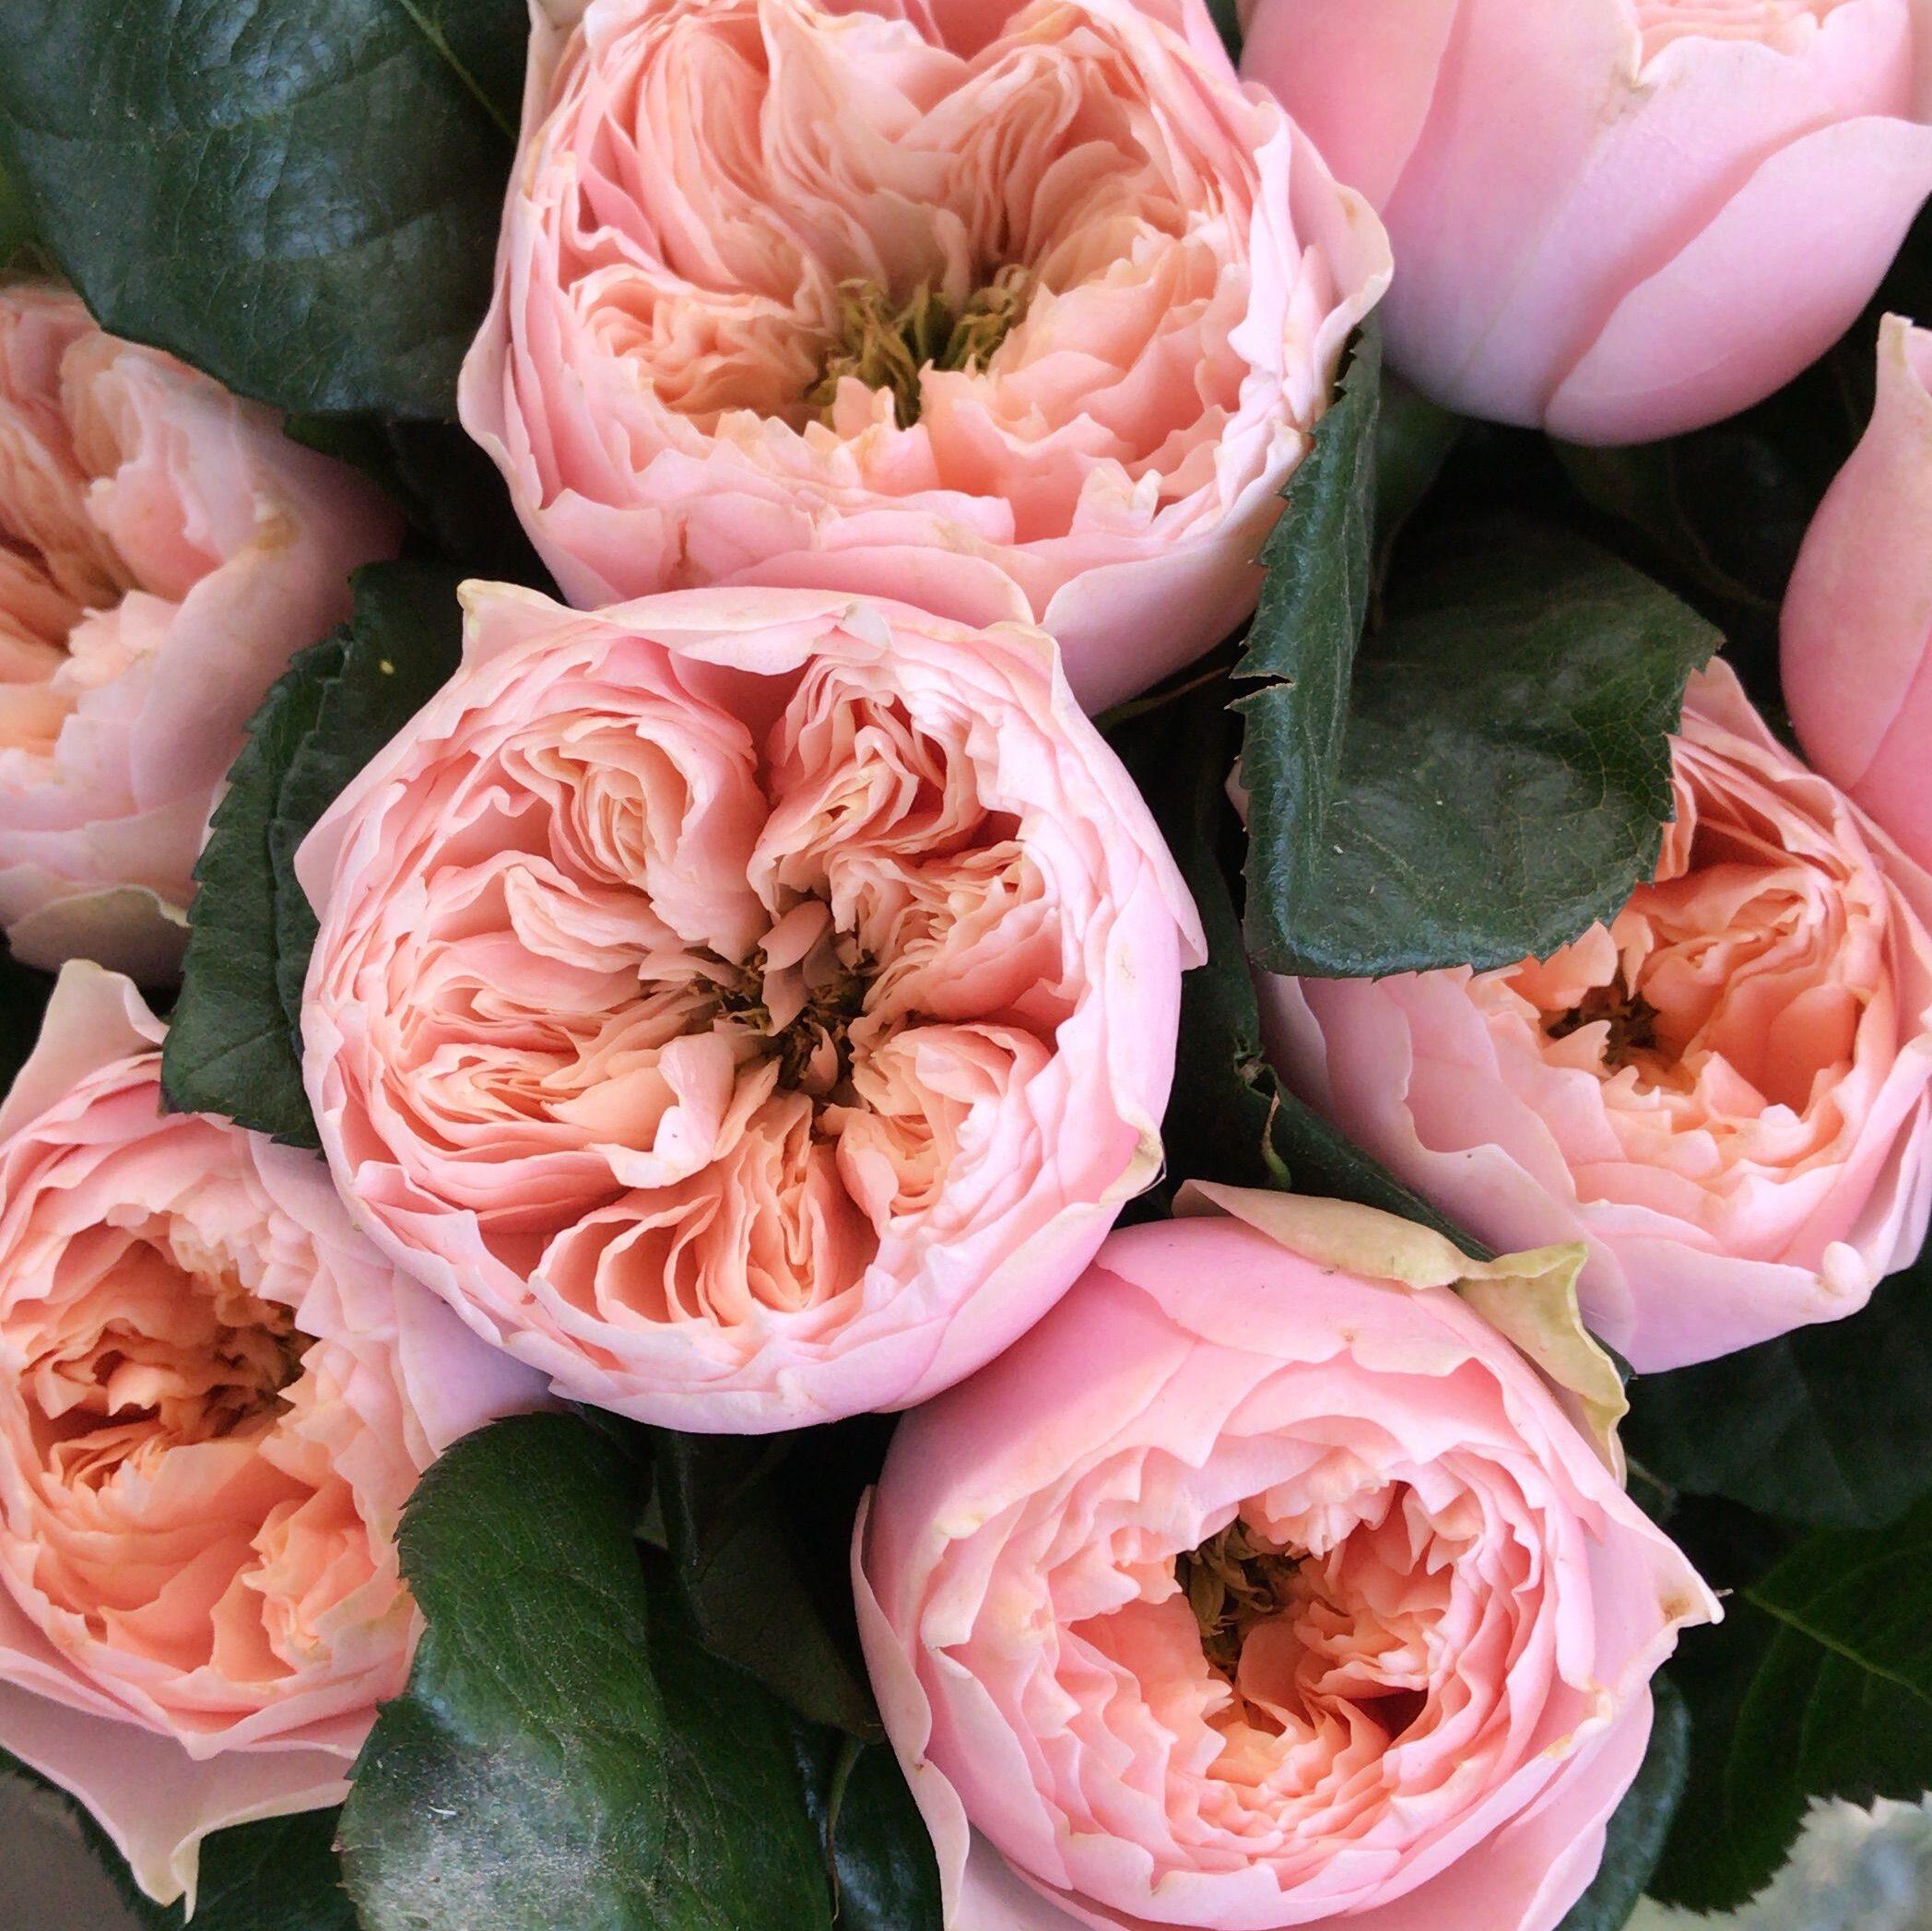 Rosa inglesa. Imagen de  Ana Cecy Machuca vía pinterest